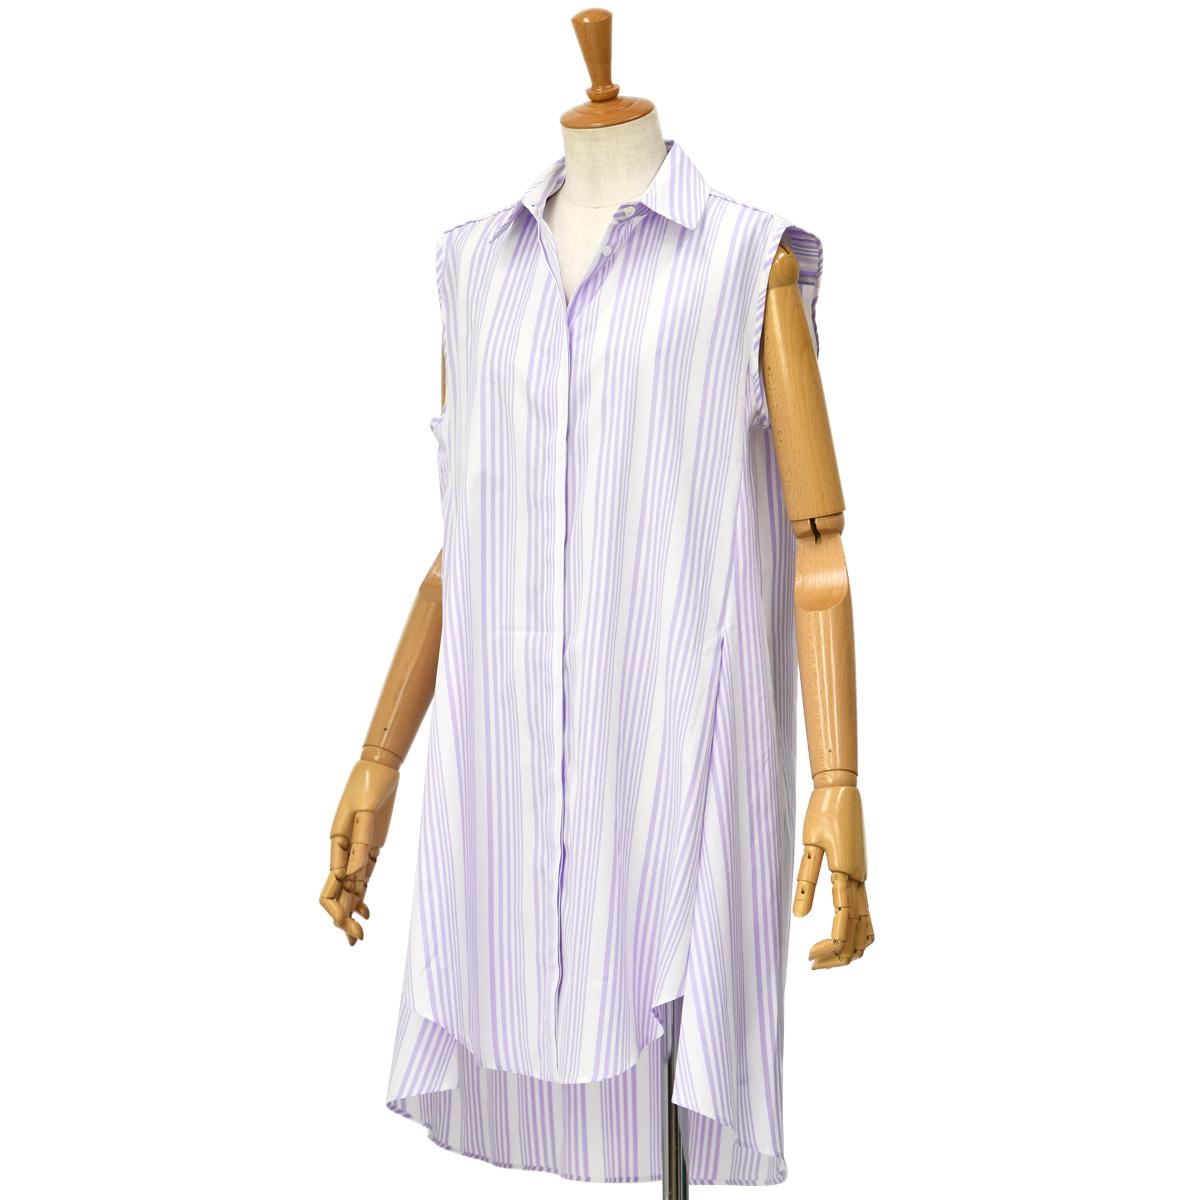 Bagutta【バグッタ】ストライプノースリーブシャツ SALLY 10408 240 コットン ラベンダー